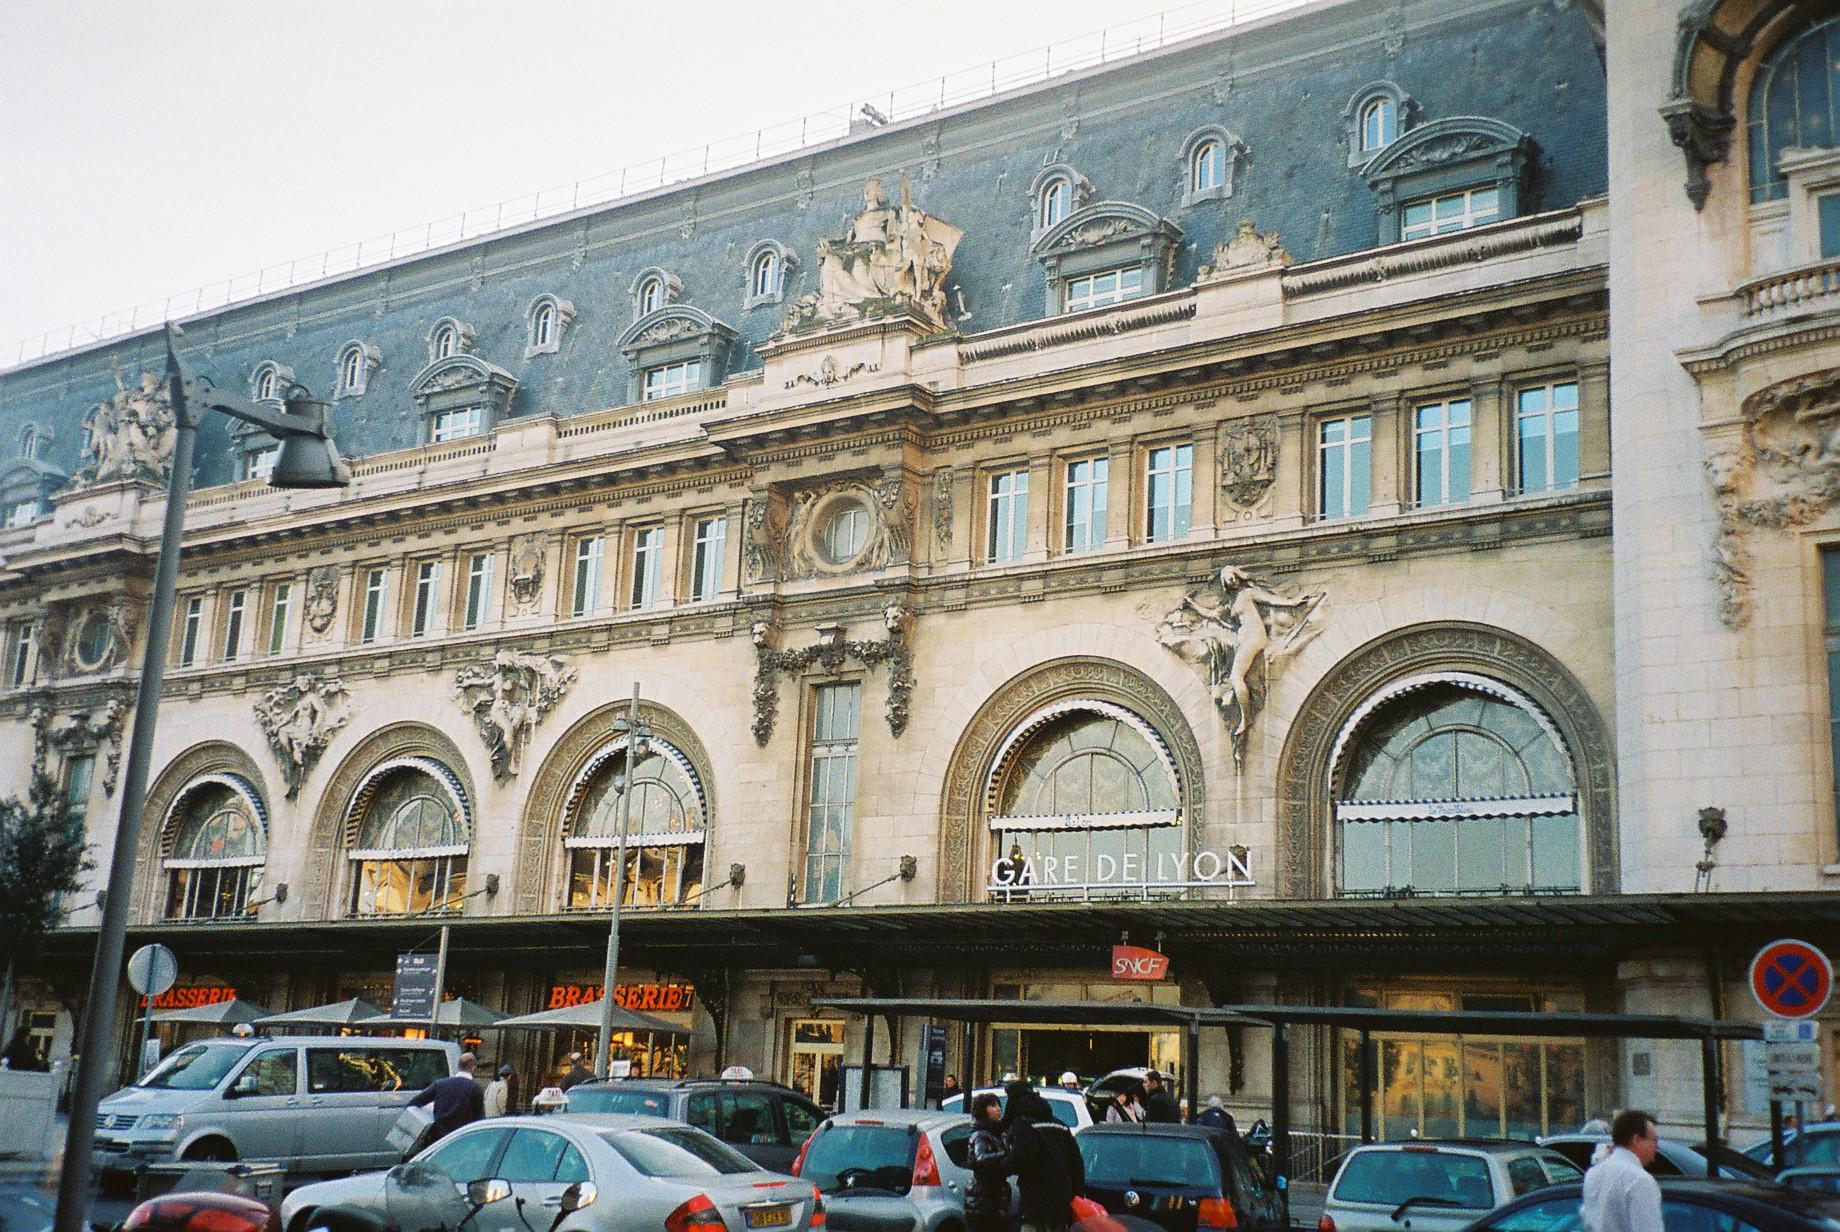 paris-gare-de-lyon-19feb09